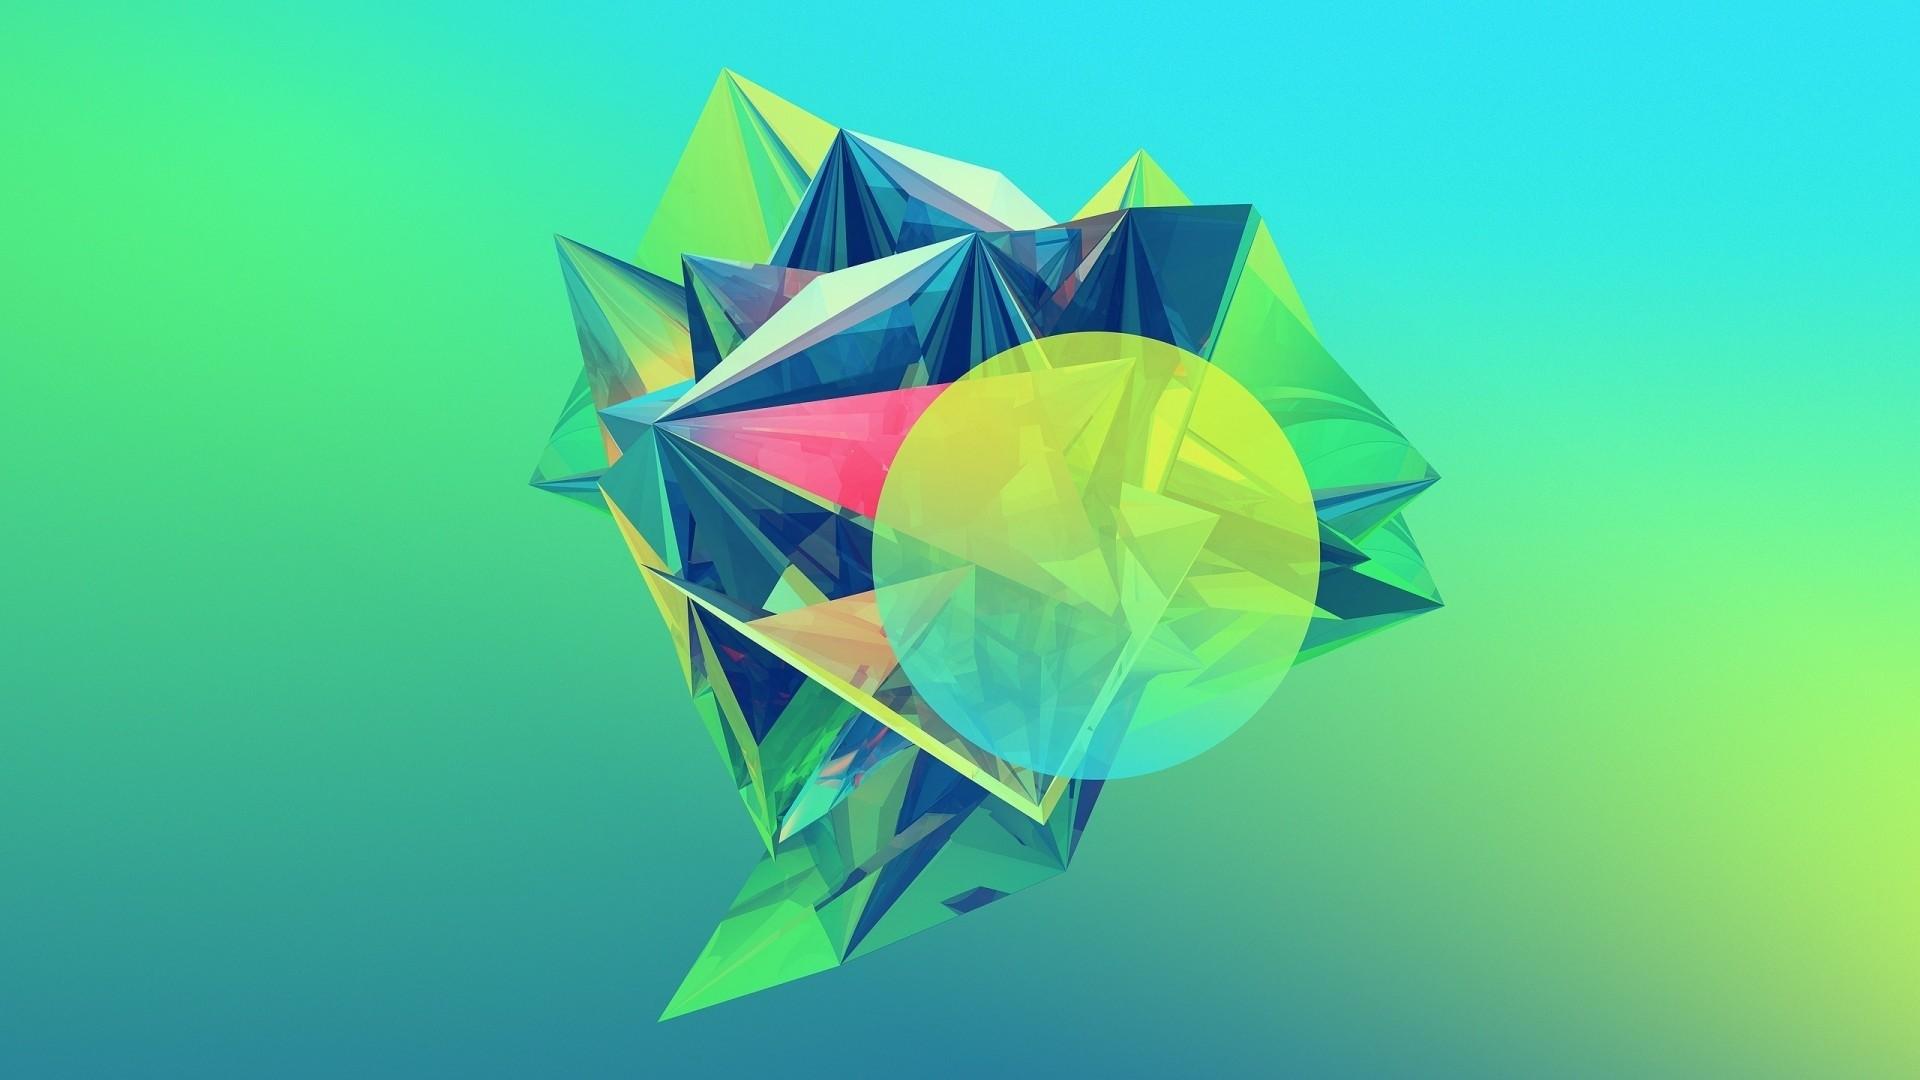 Geometric Wallpaper image hd